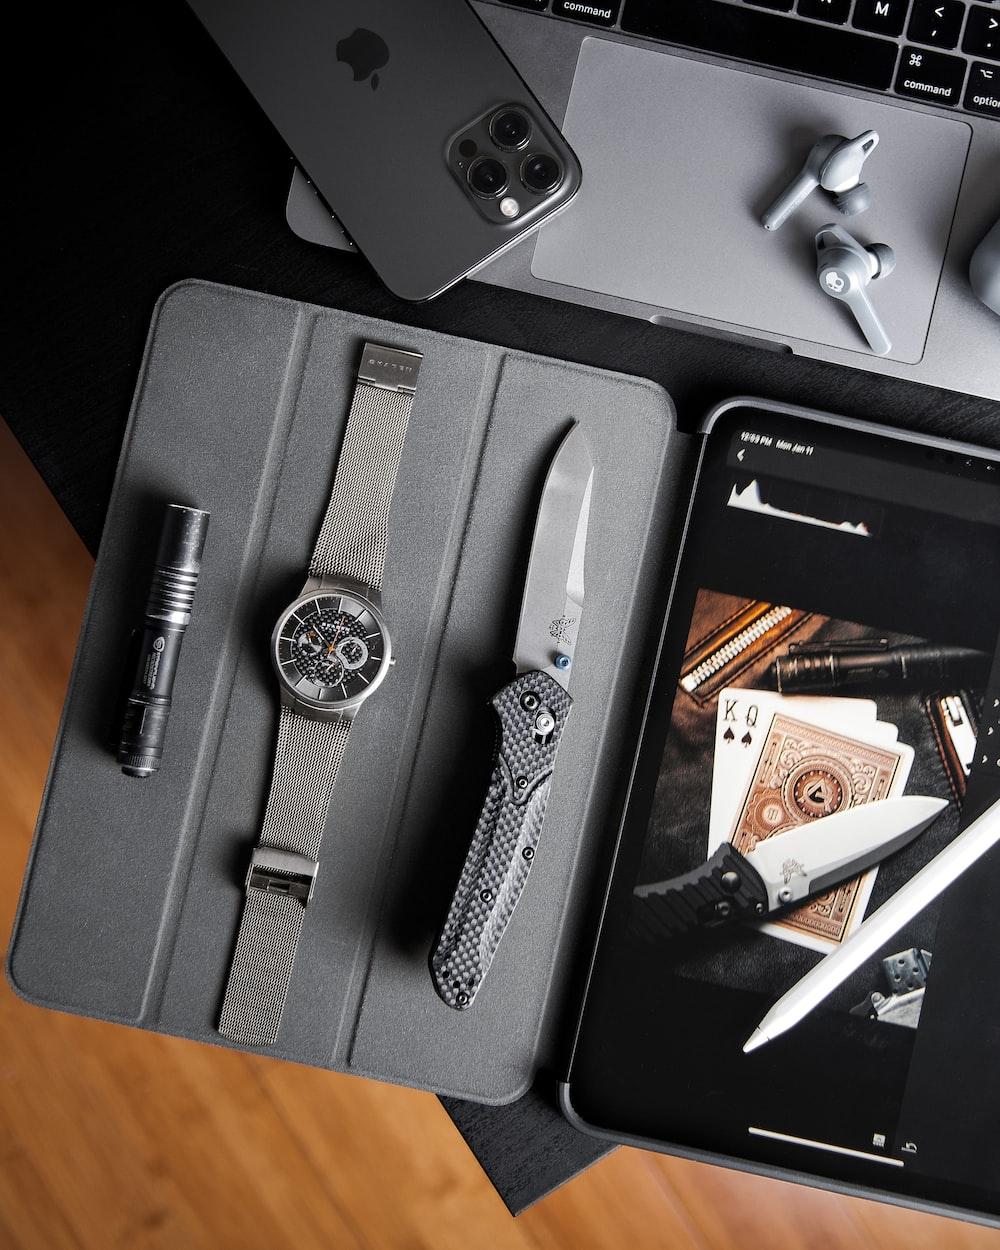 black and silver scissors on black case